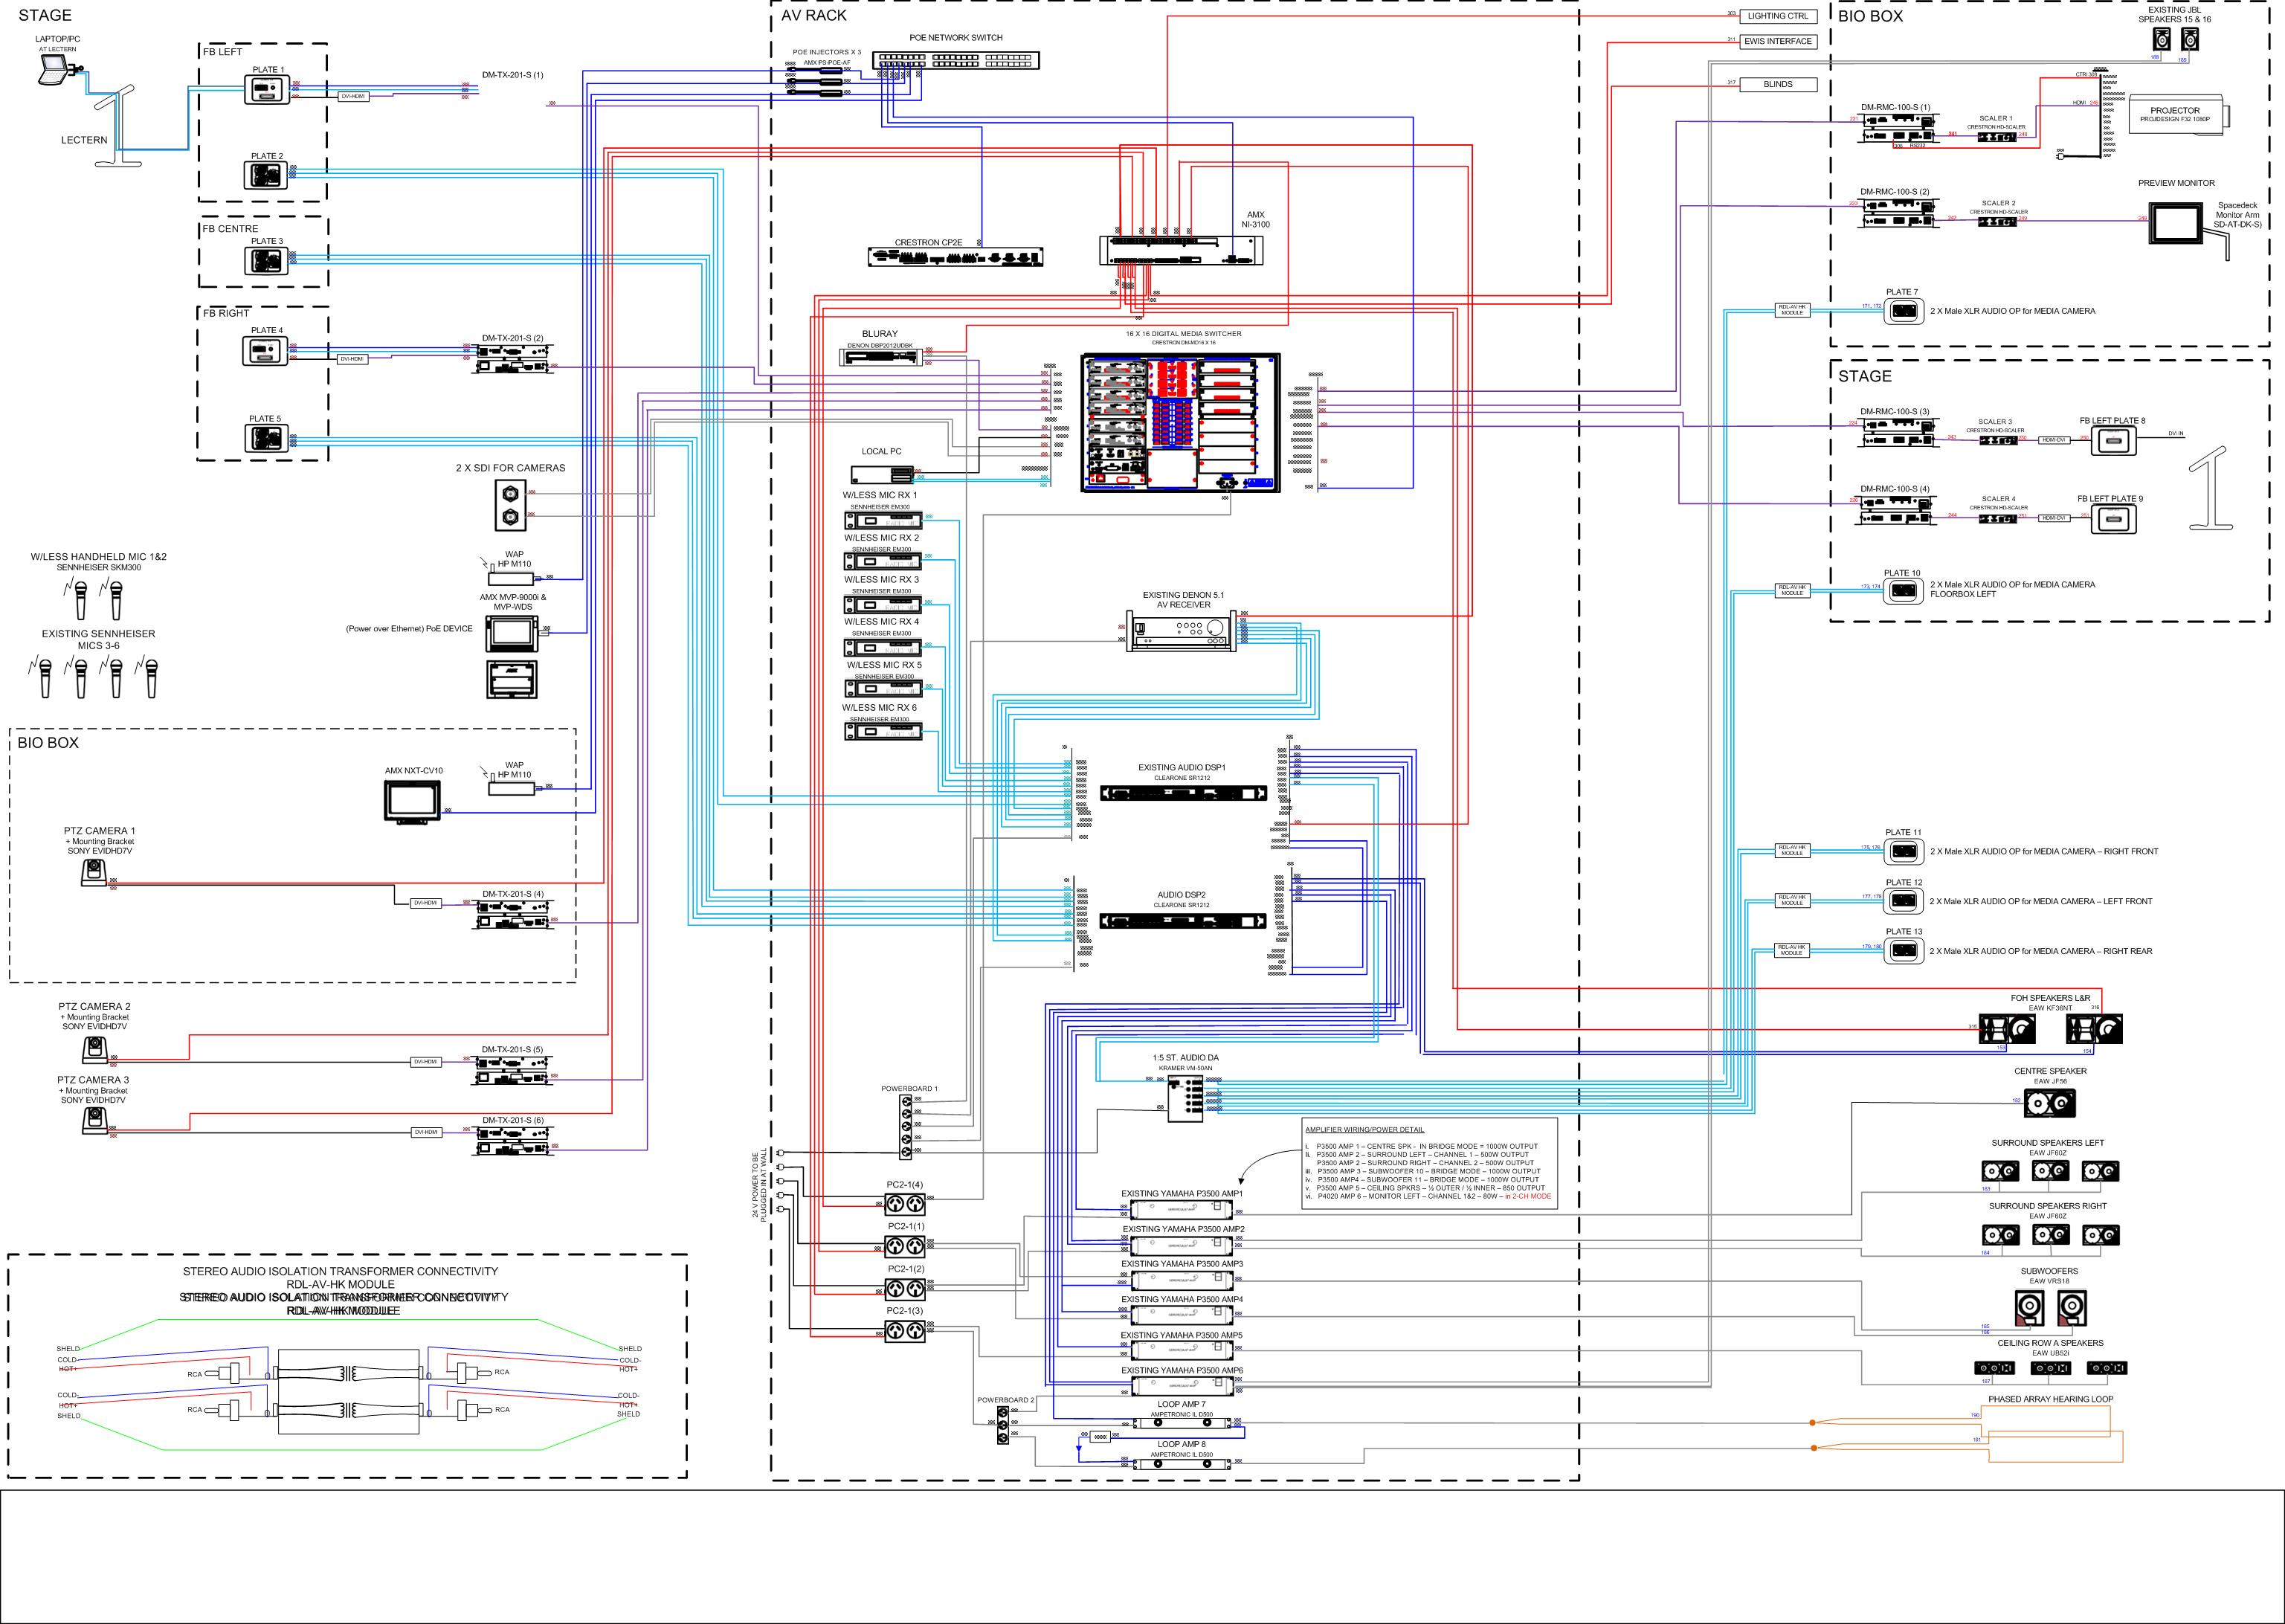 [DIAGRAM_5NL]  Draw a floor, technical or circuit diagram using visio or google design  tool by Knas11 | Car Wiring Diagram Visio |  | Fiverr